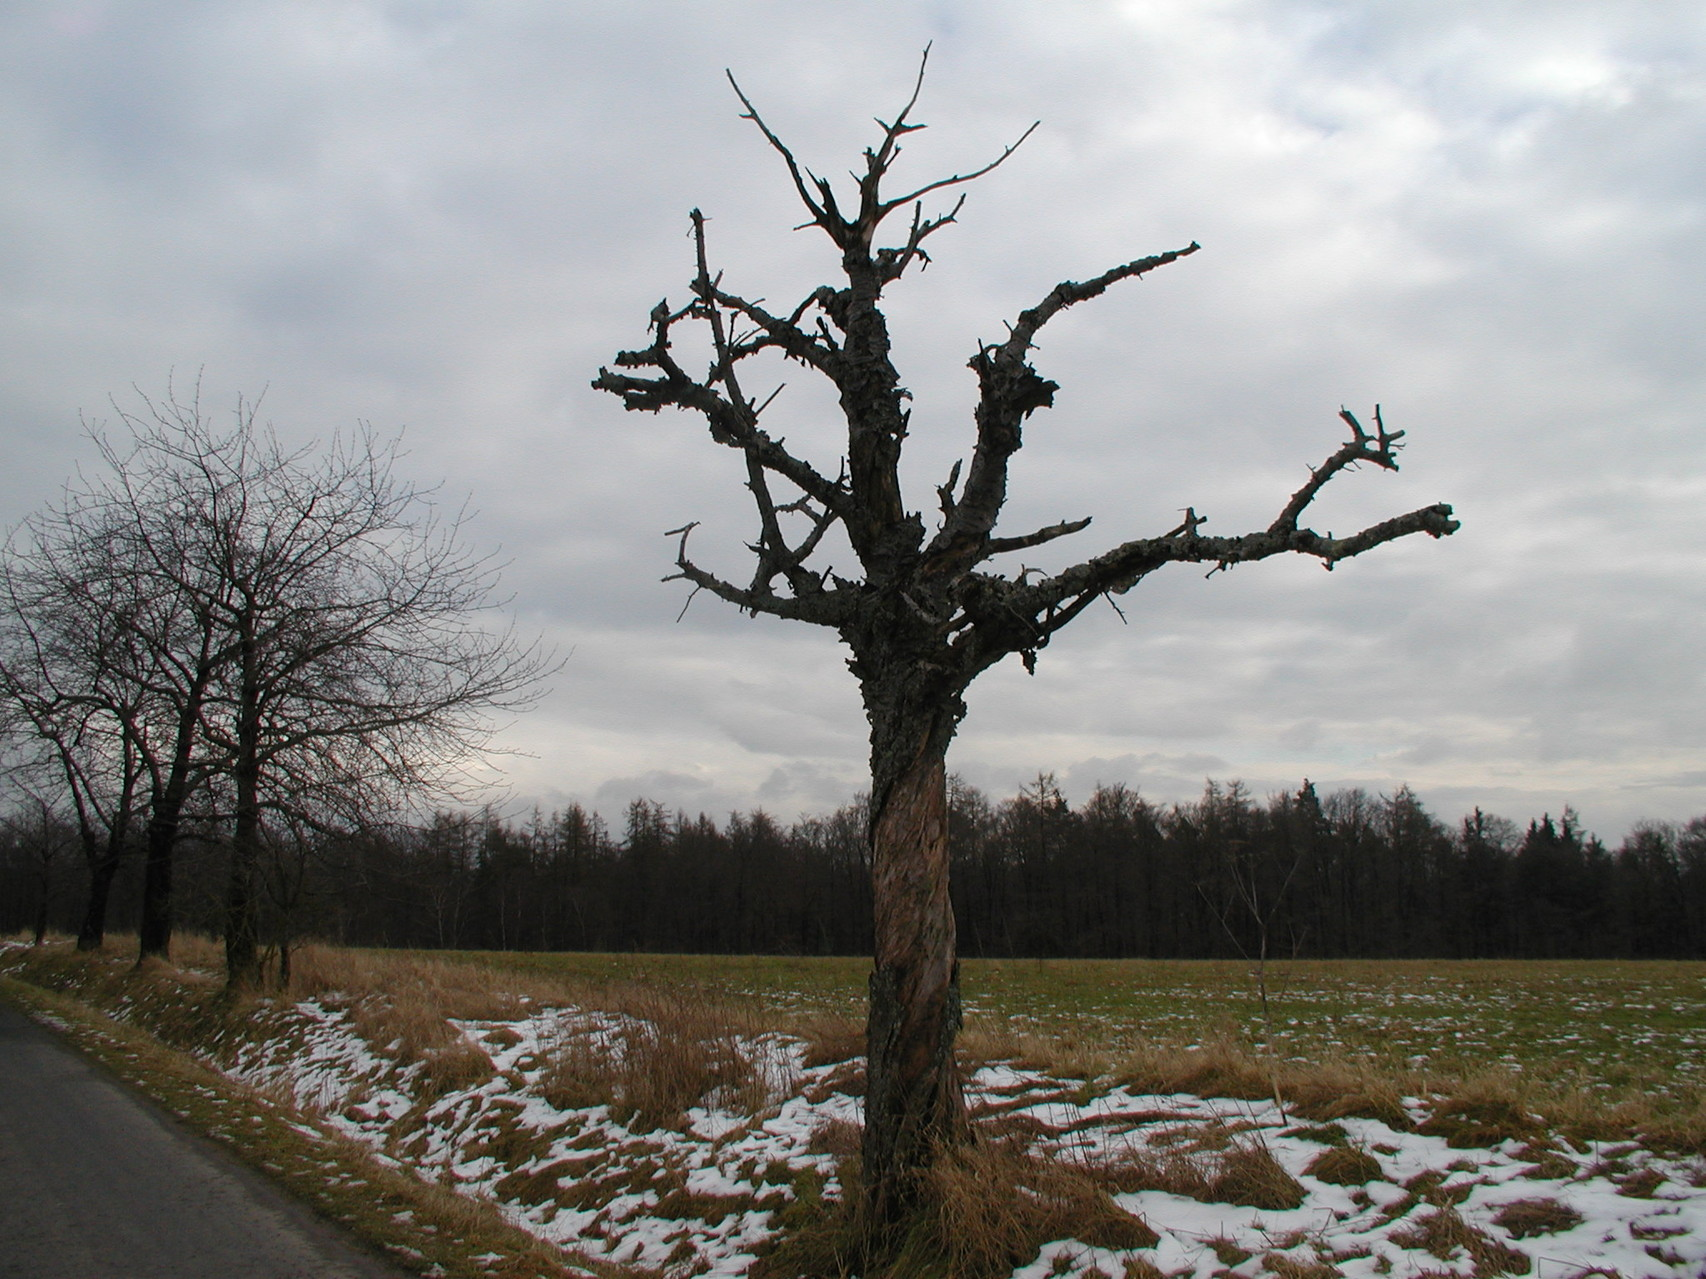 Rundwanderung am 17. Februar - Unterafferbach